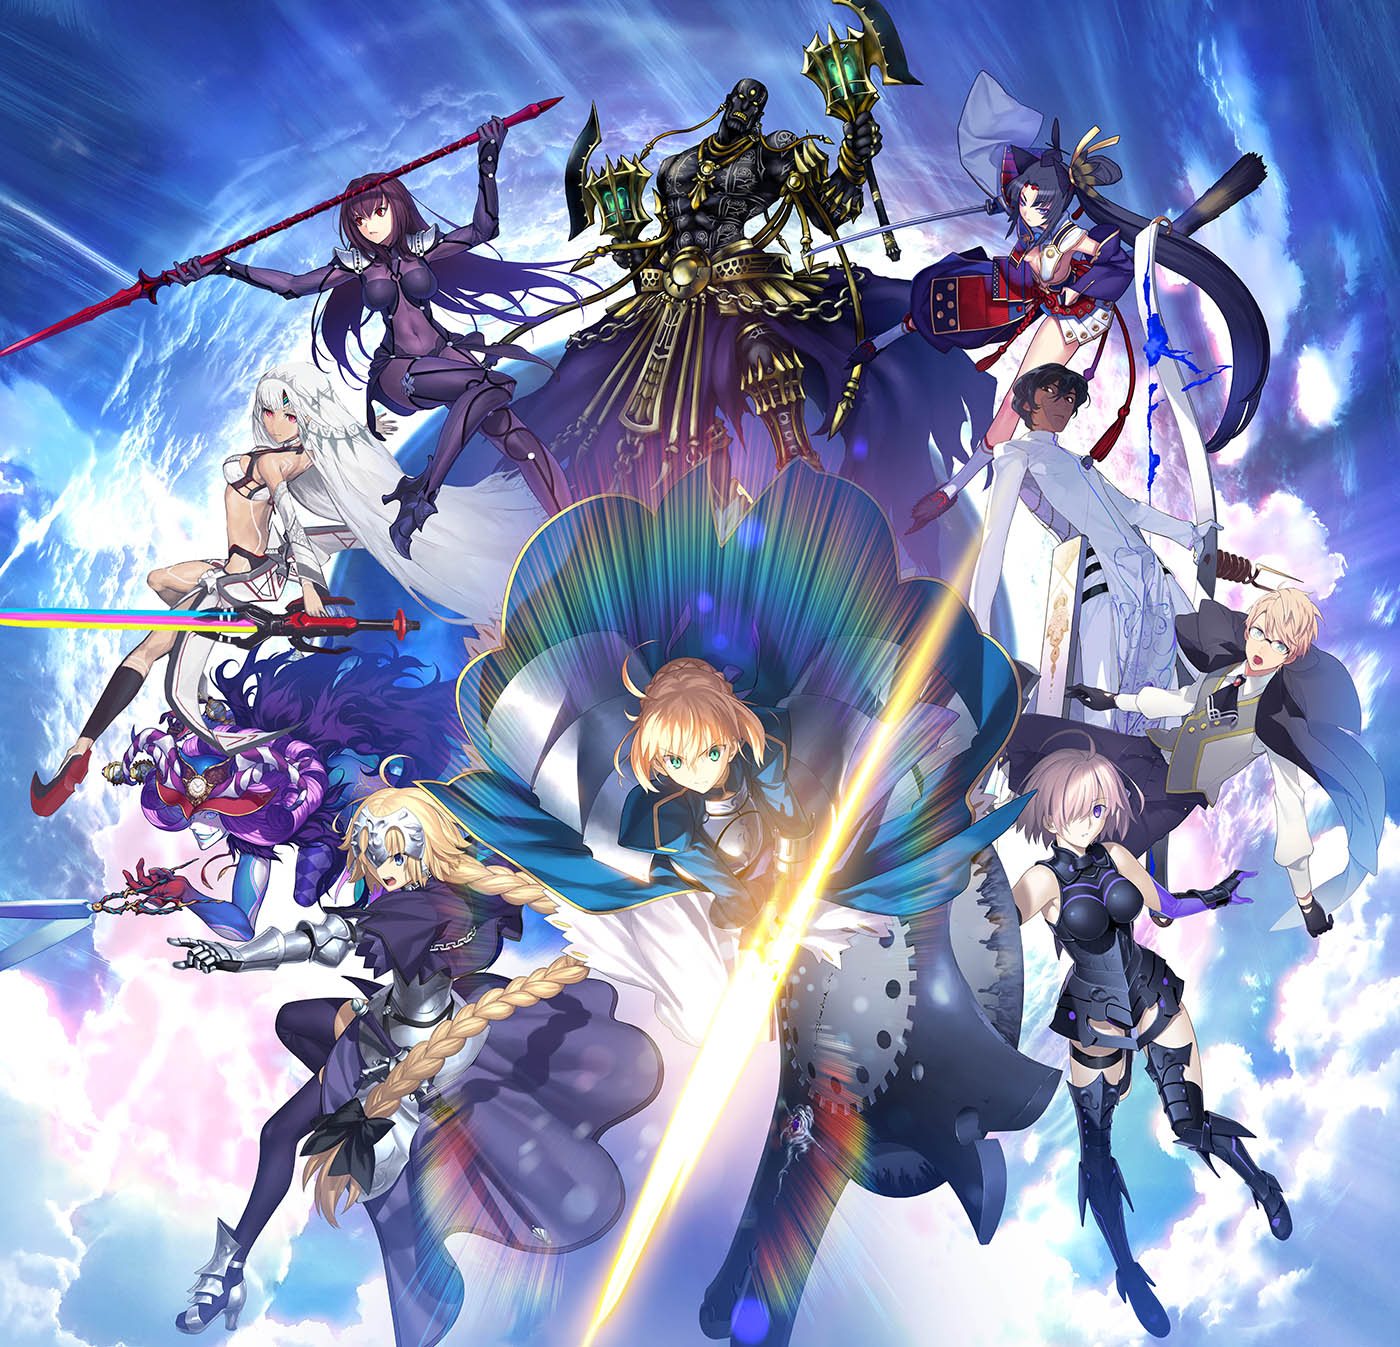 Fate/Grand Order NA Announces the 1 Million Downloads